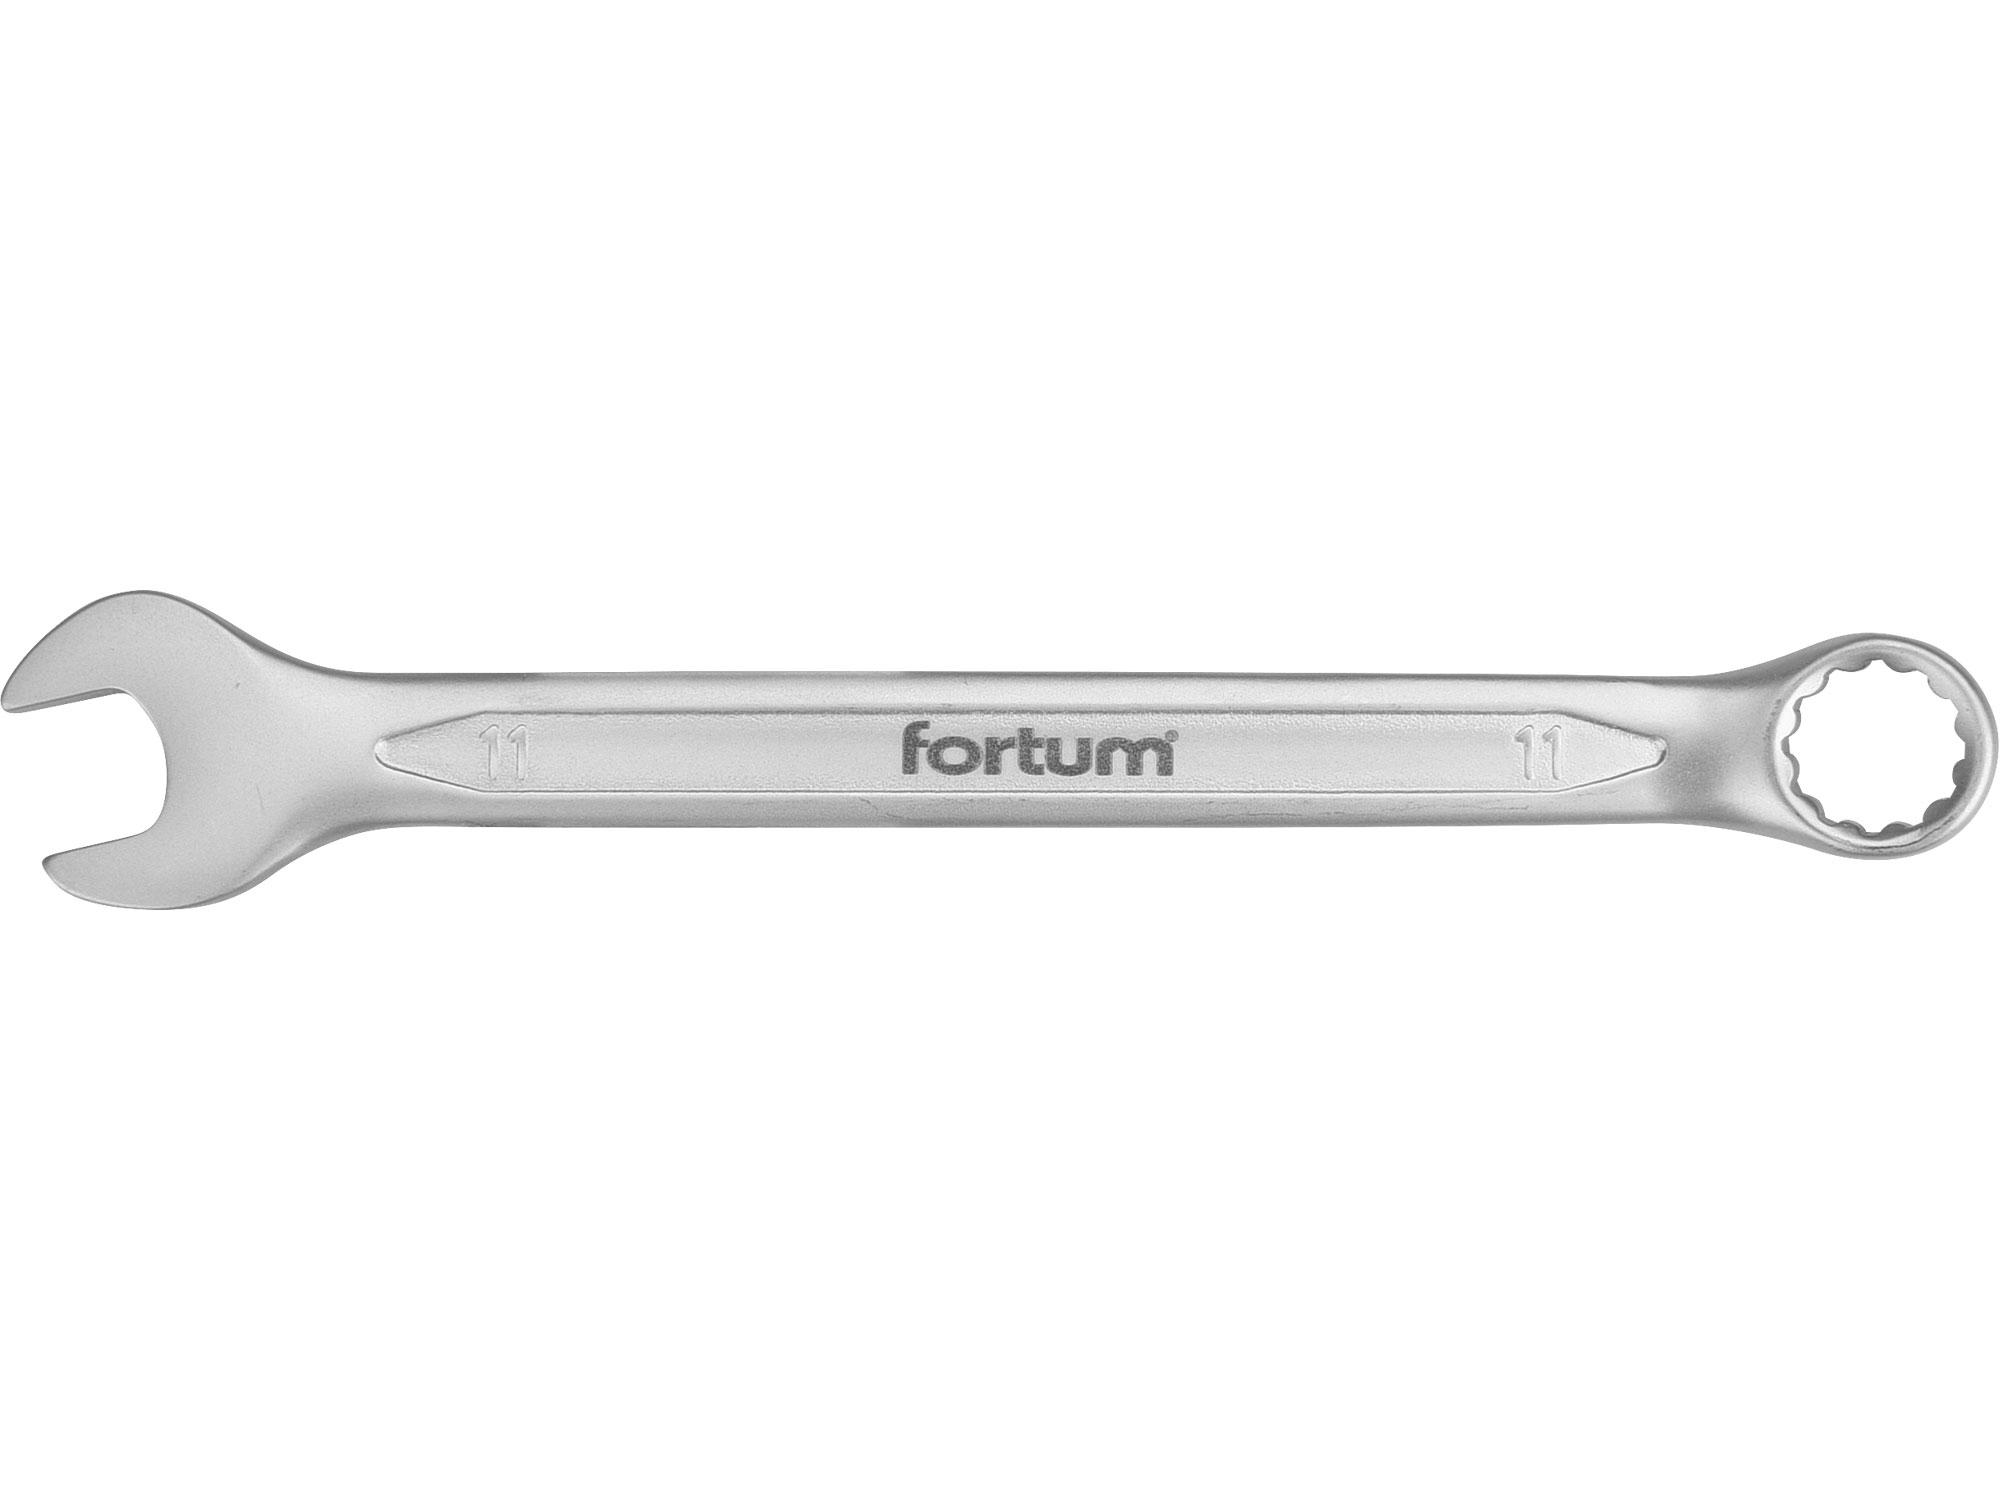 klíč očkoplochý, 11mm, L 161mm, FORTUM 4730211